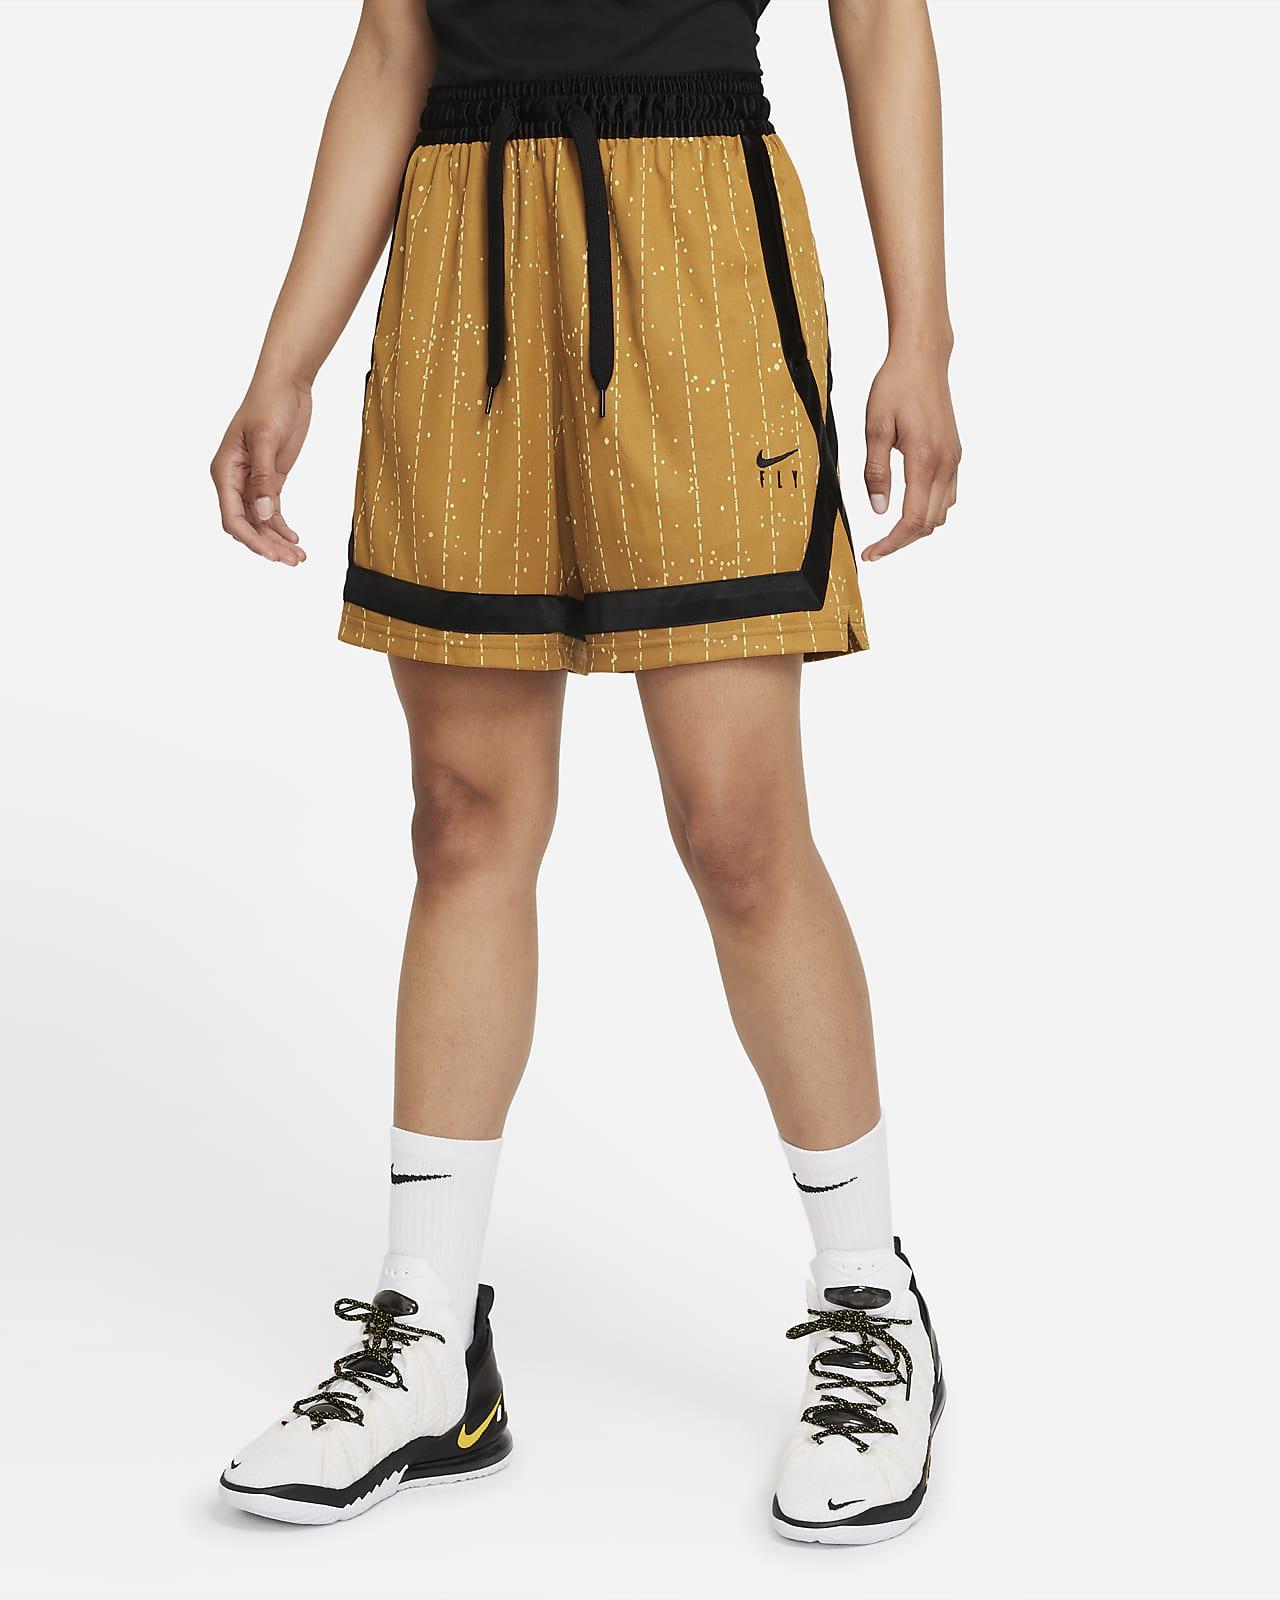 Short de basketball Nike Dri-FIT Swoosh Fly Crossover pour Femme